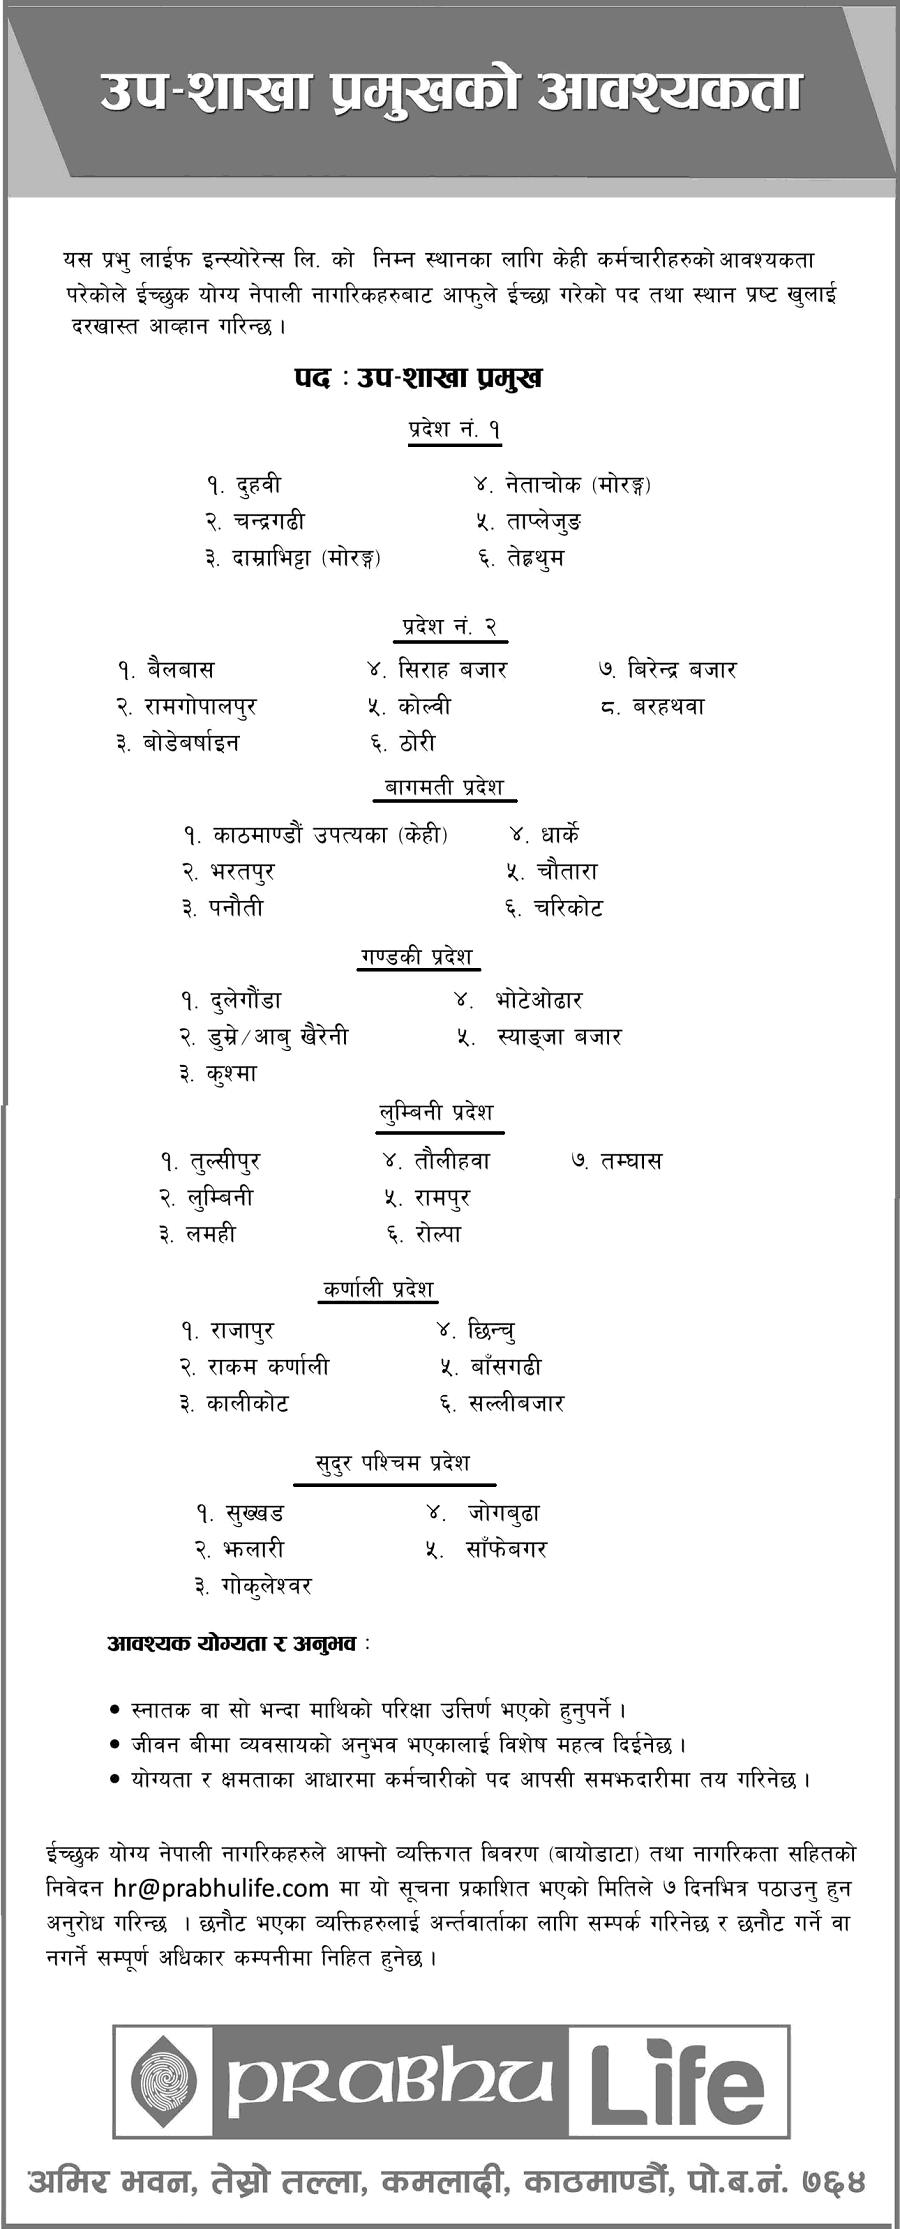 Prabhu-LIfe-Insurance-Job-Vacancy-for-Sub-Brach-Head-in-7-Provinces